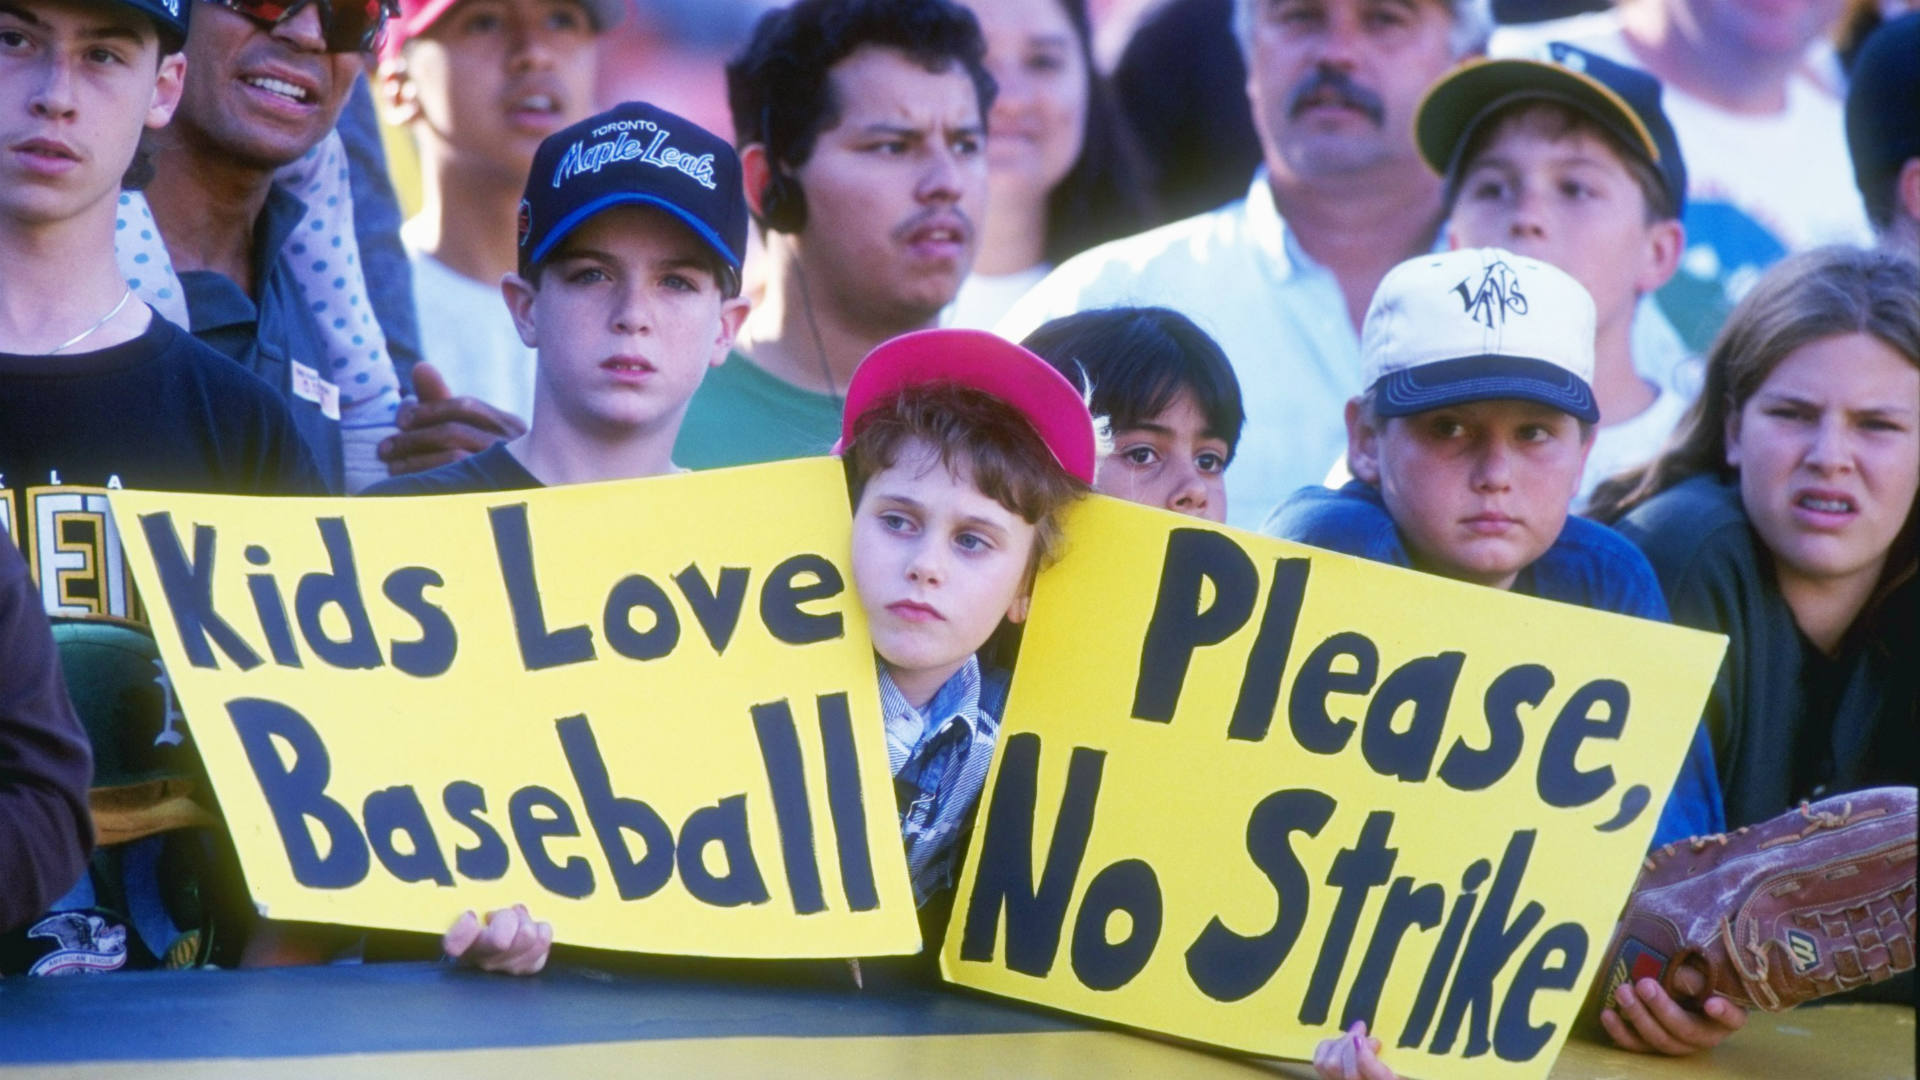 Baseball owners, MLBPA cannot stupidly allow money squabbles to halt momentum toward 2020 restart 1